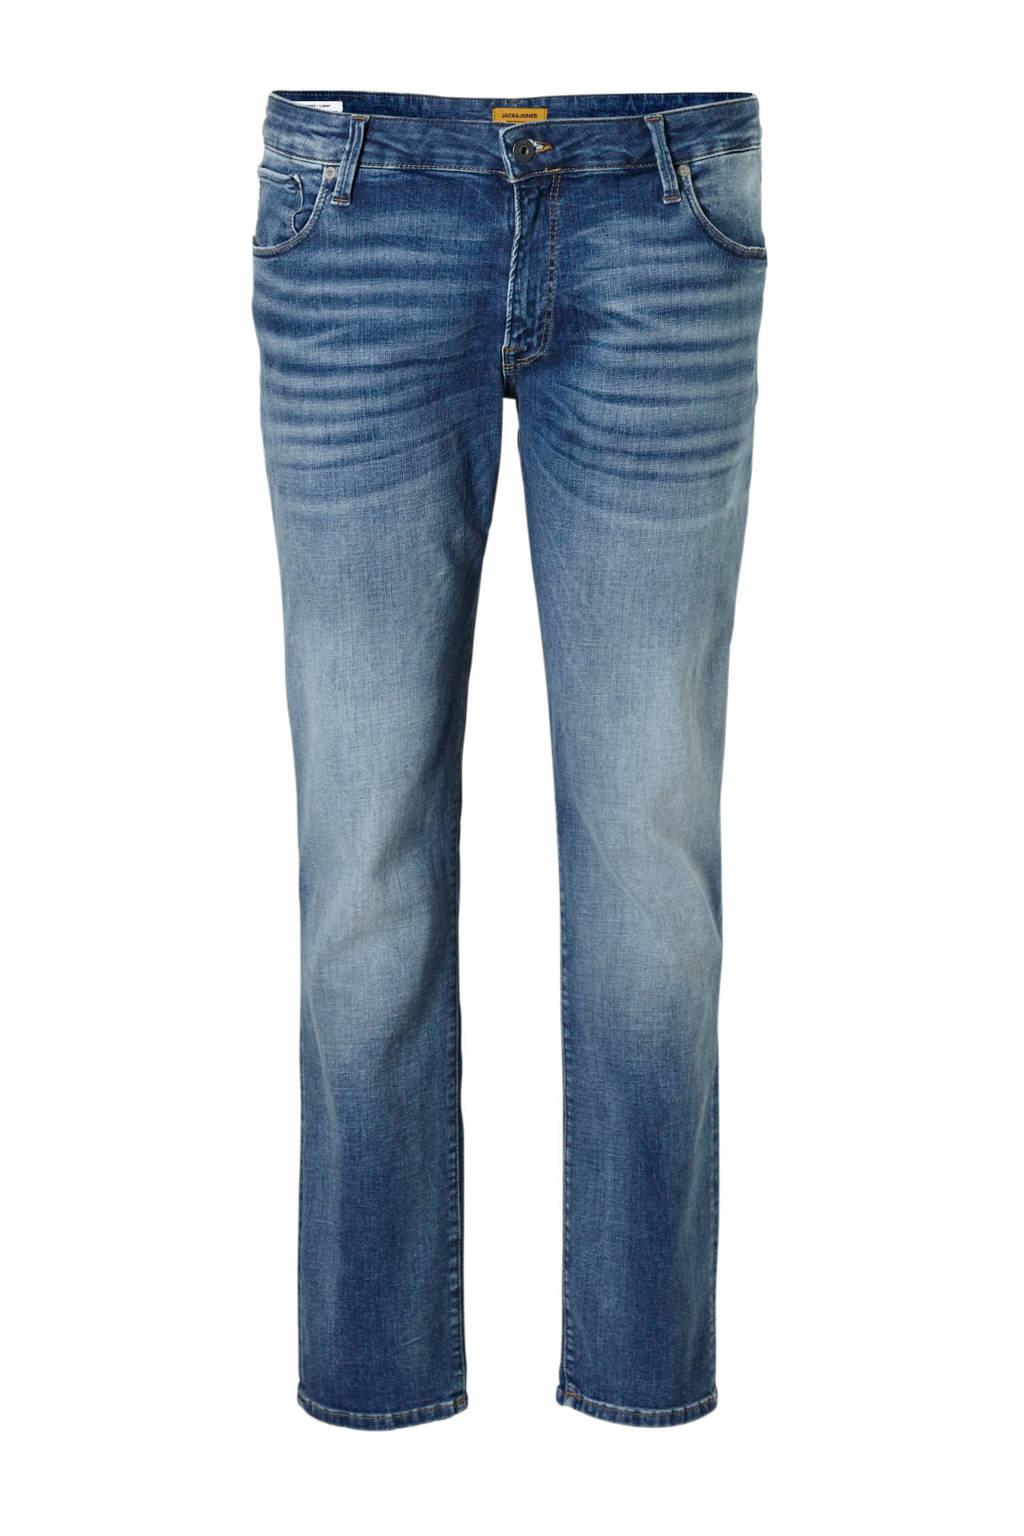 Jack & Jones Plus Size skinny fit jeans Liam, Dark denim